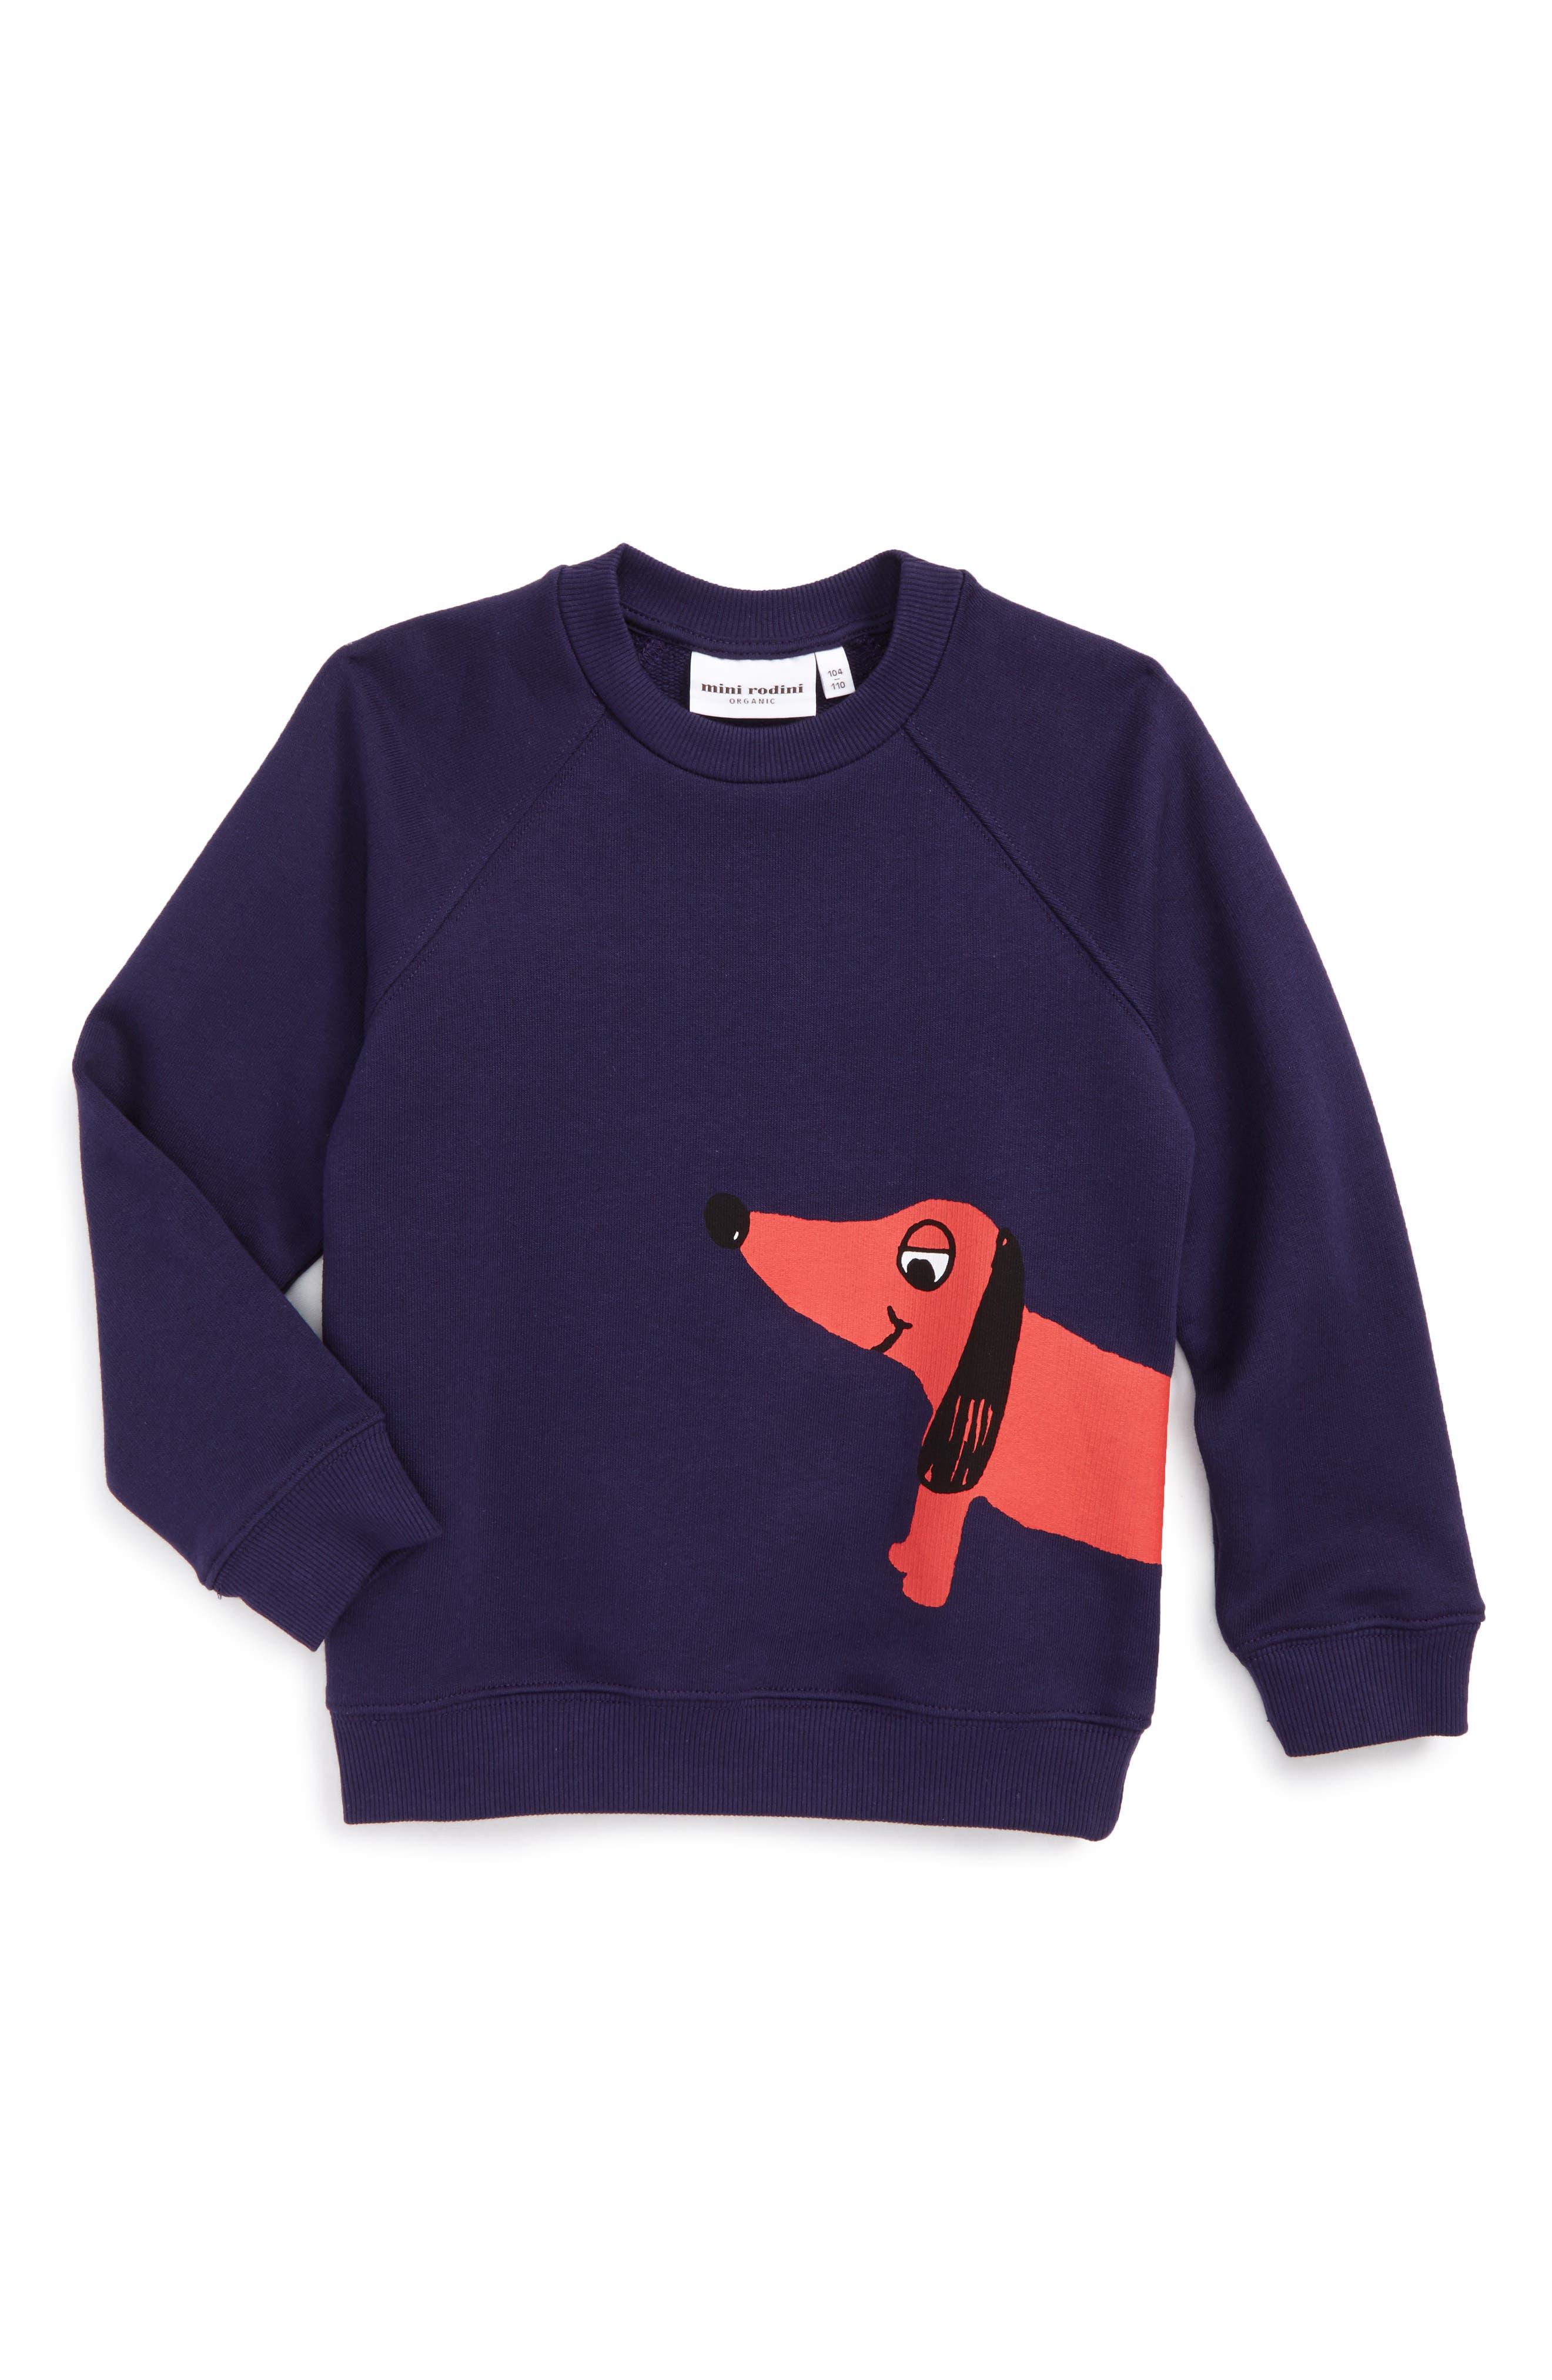 Alternate Image 1 Selected - Mini Rodini Dog Sweatshirt (Toddler Boys & Little Boys)